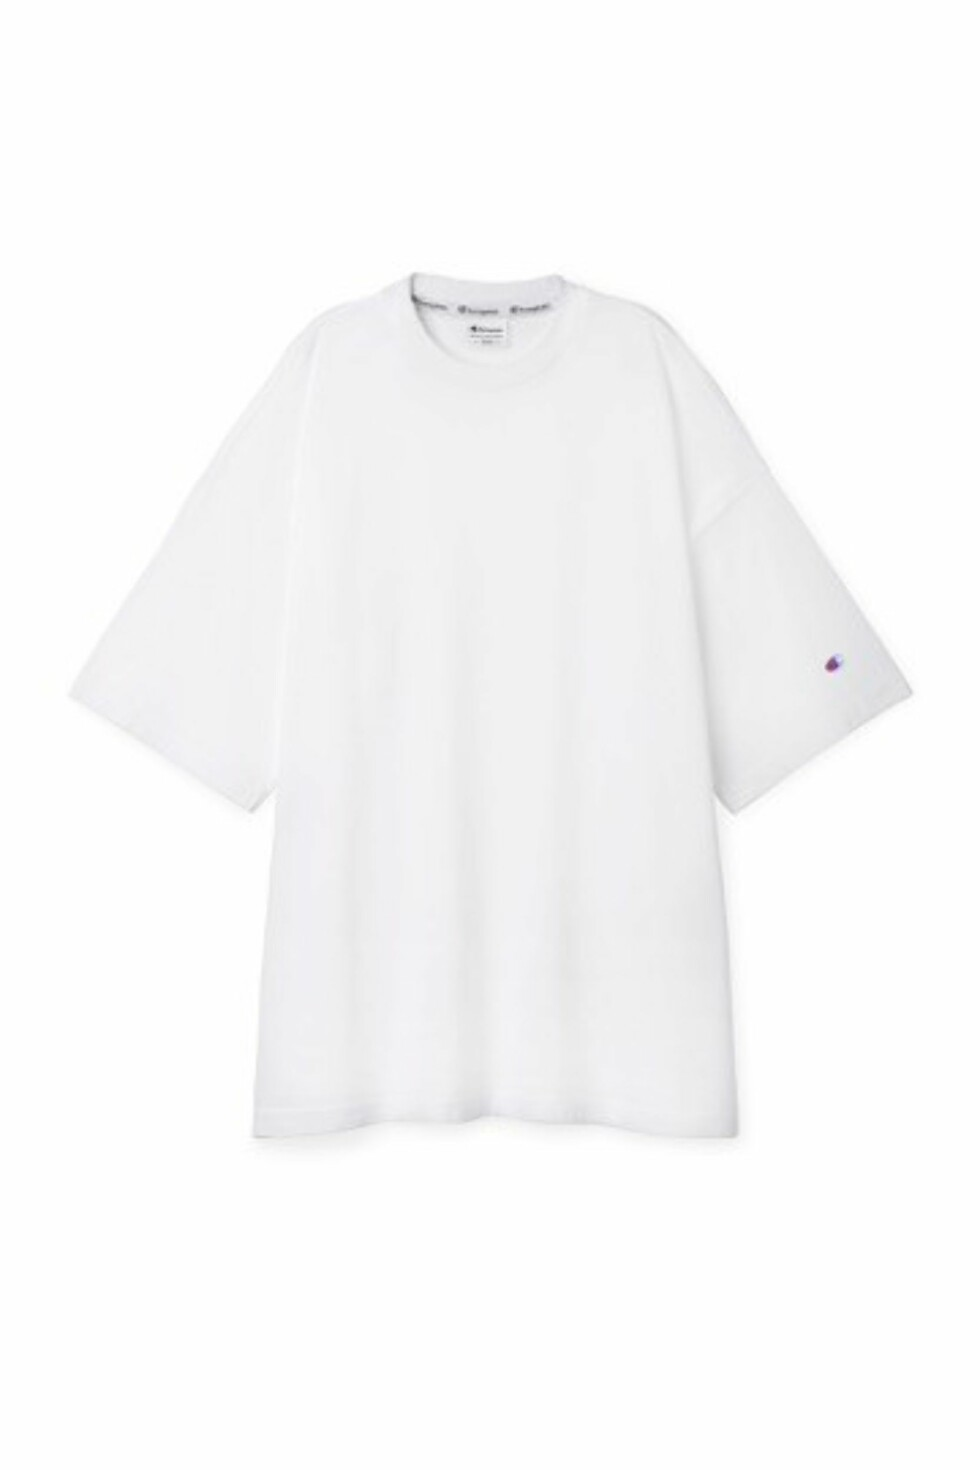 T-skjorte fra Champion x Weekday, kr 500.